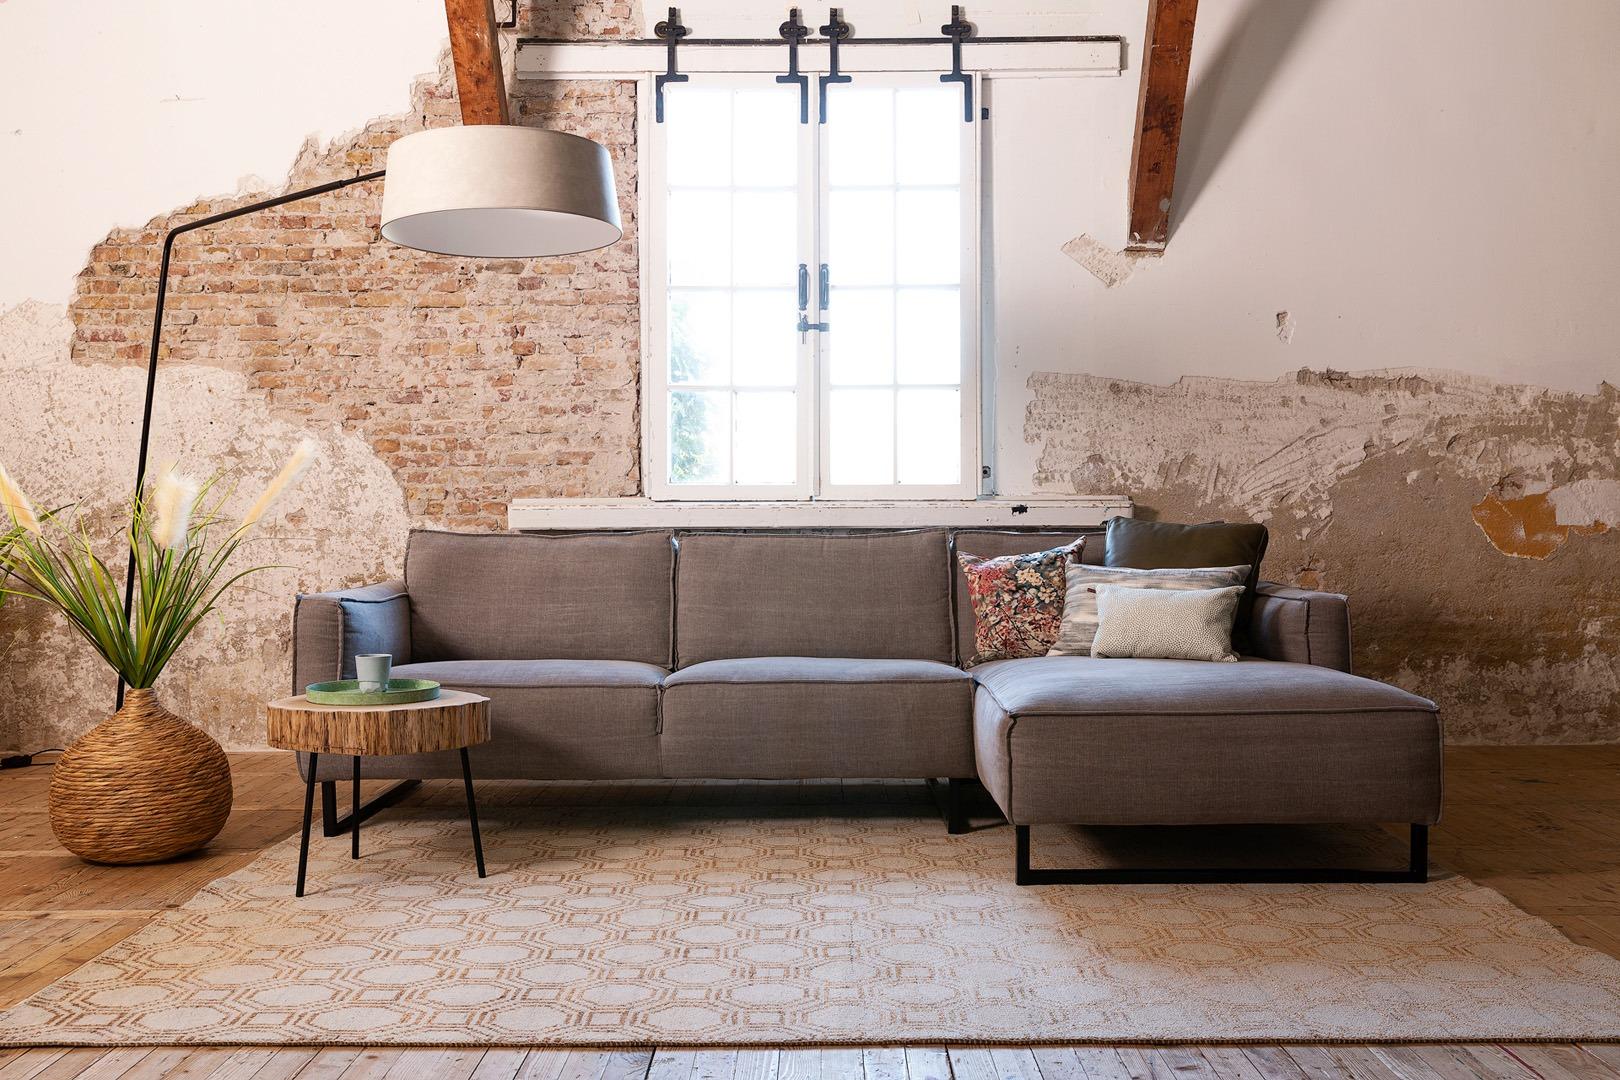 new-yorker-hoekbank-longchair-grijs-stof-soofs-interieur-6- (1)